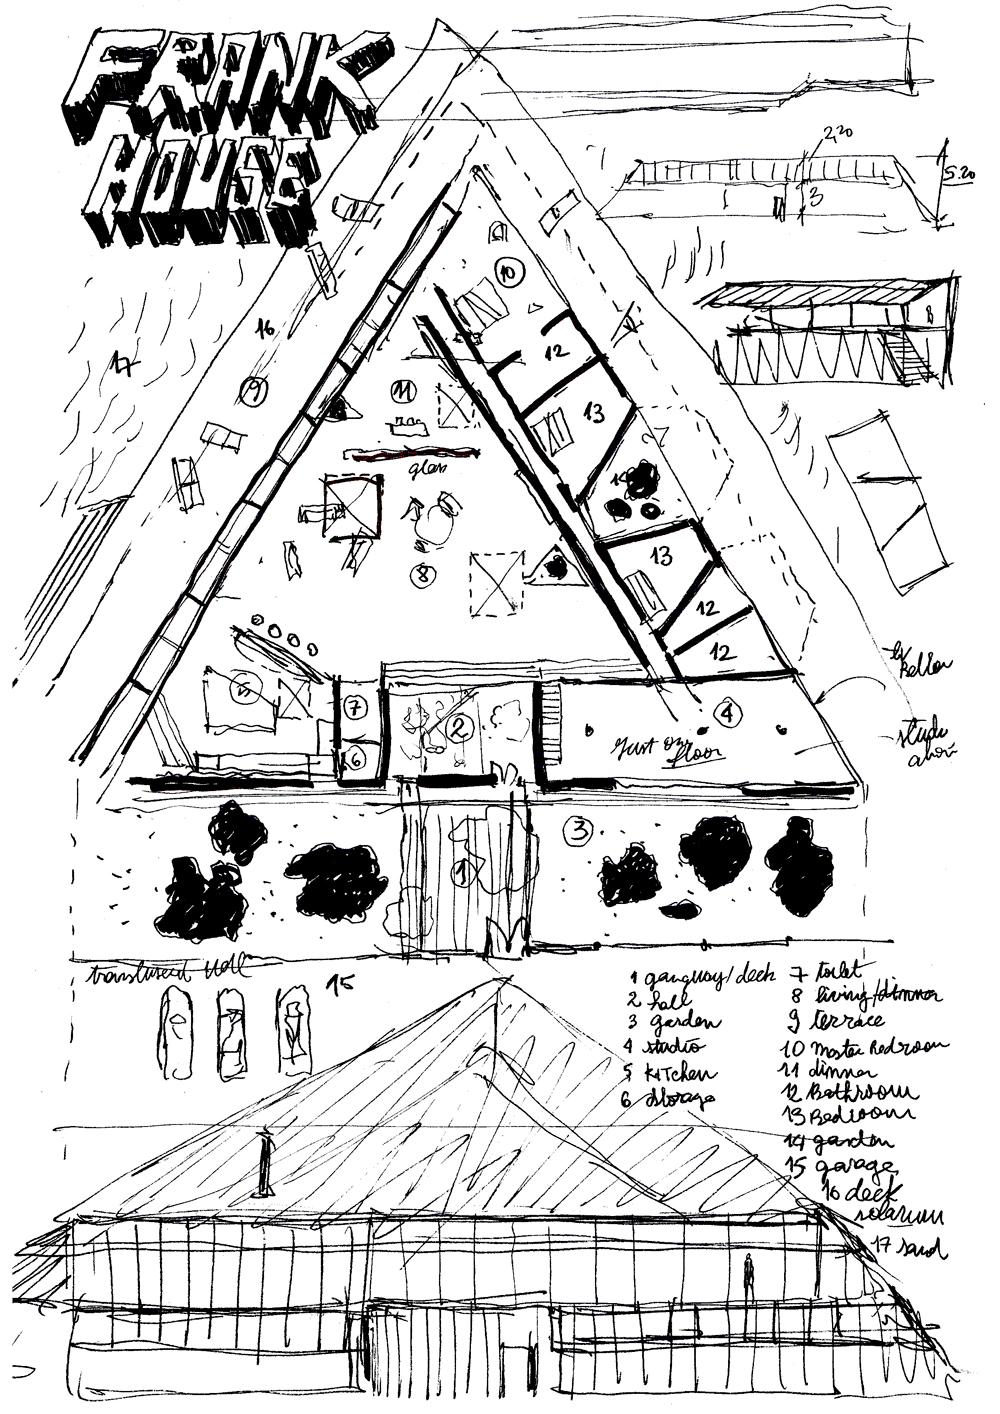 FRANK-HOUSE.jpg